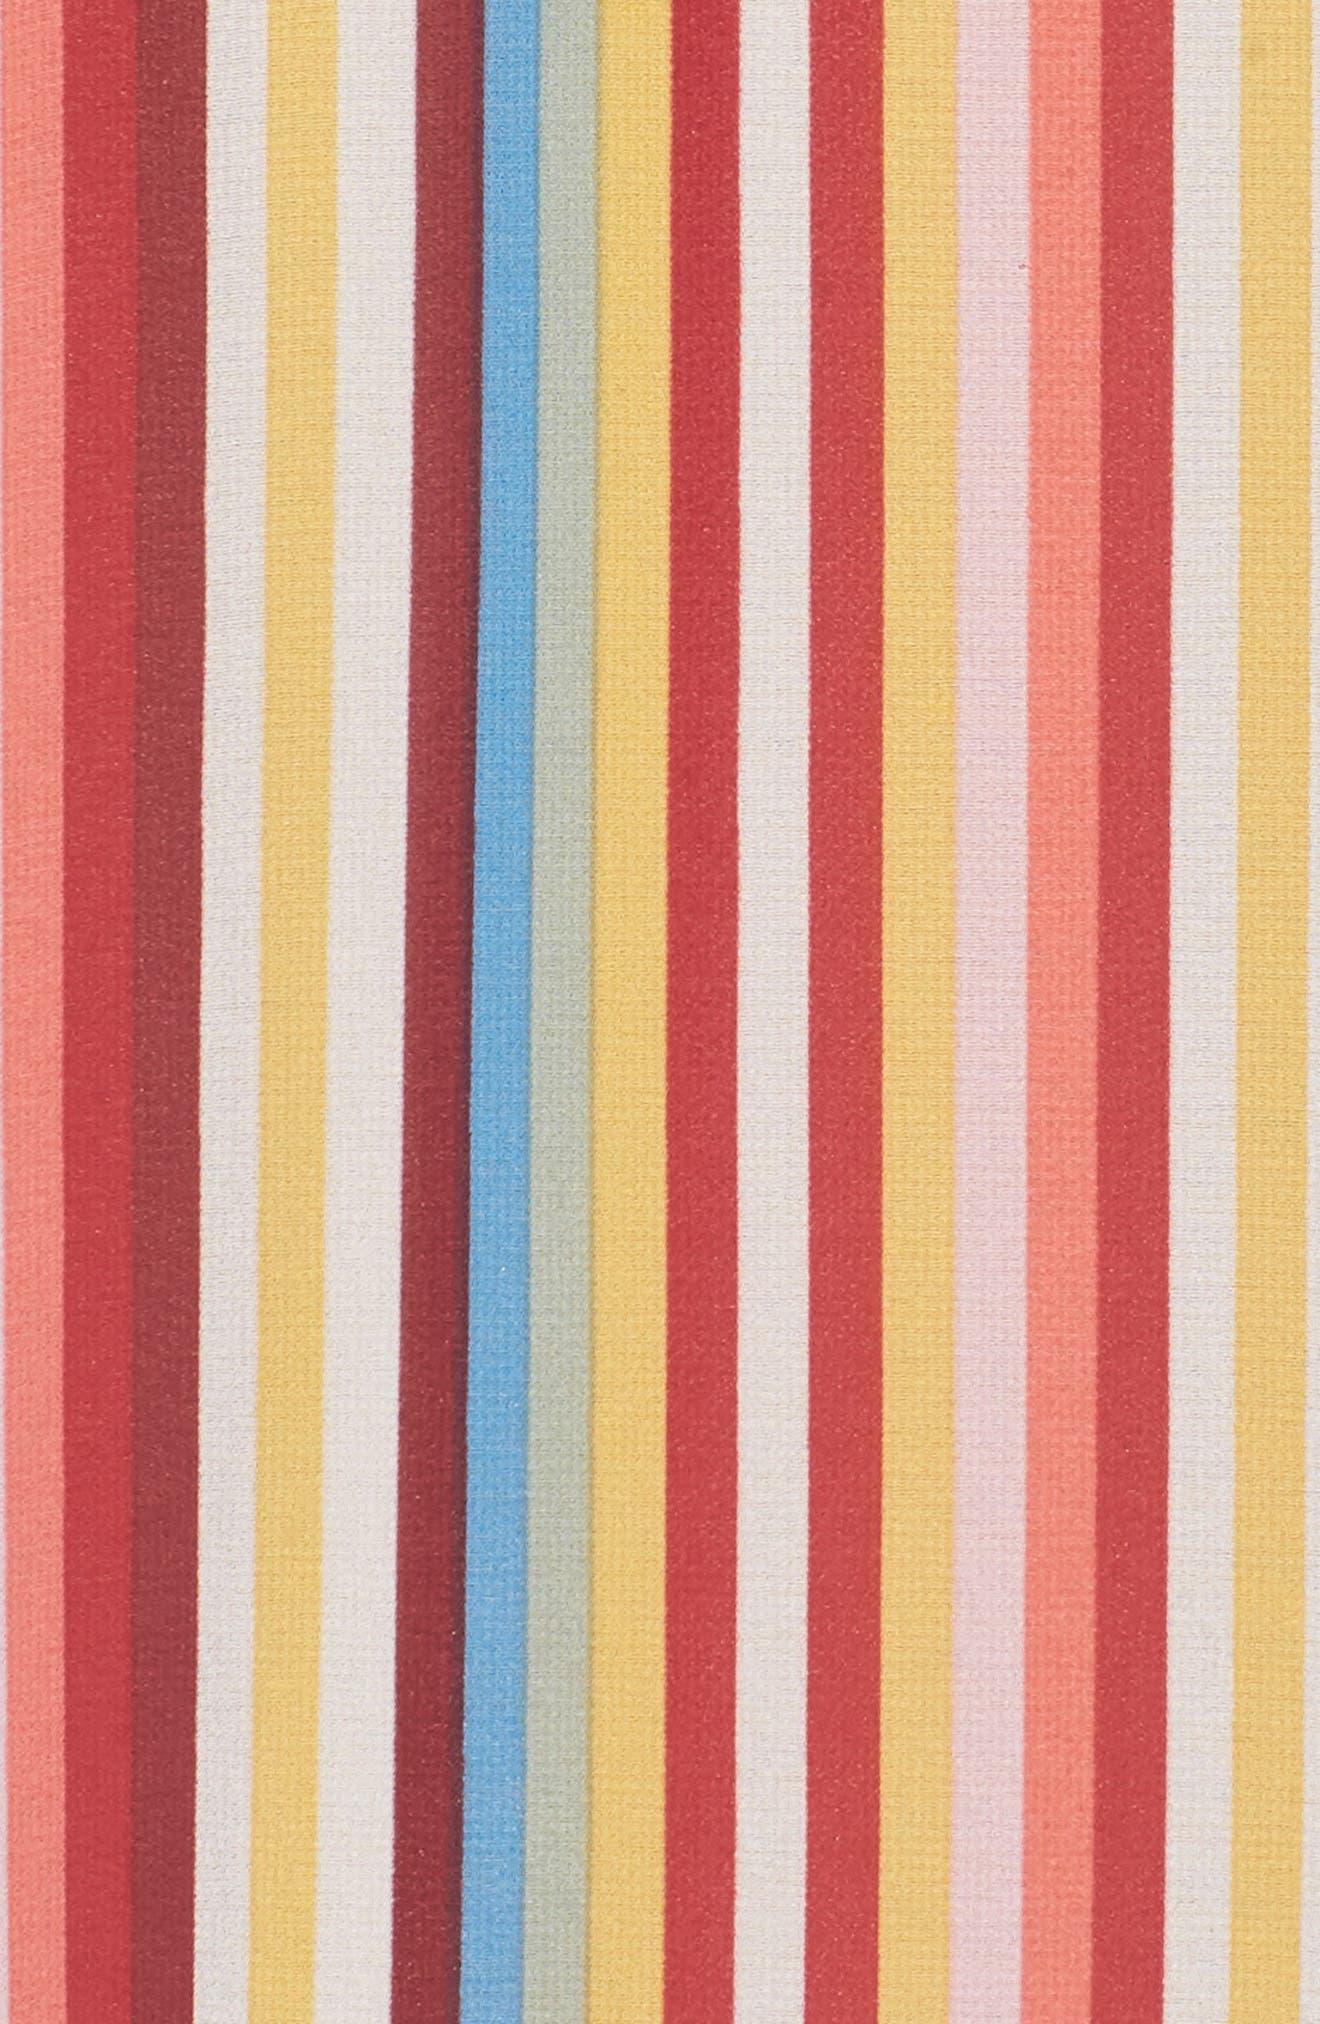 Bobby Wrap Maxi Dress,                             Alternate thumbnail 6, color,                             Red Multi Stripe